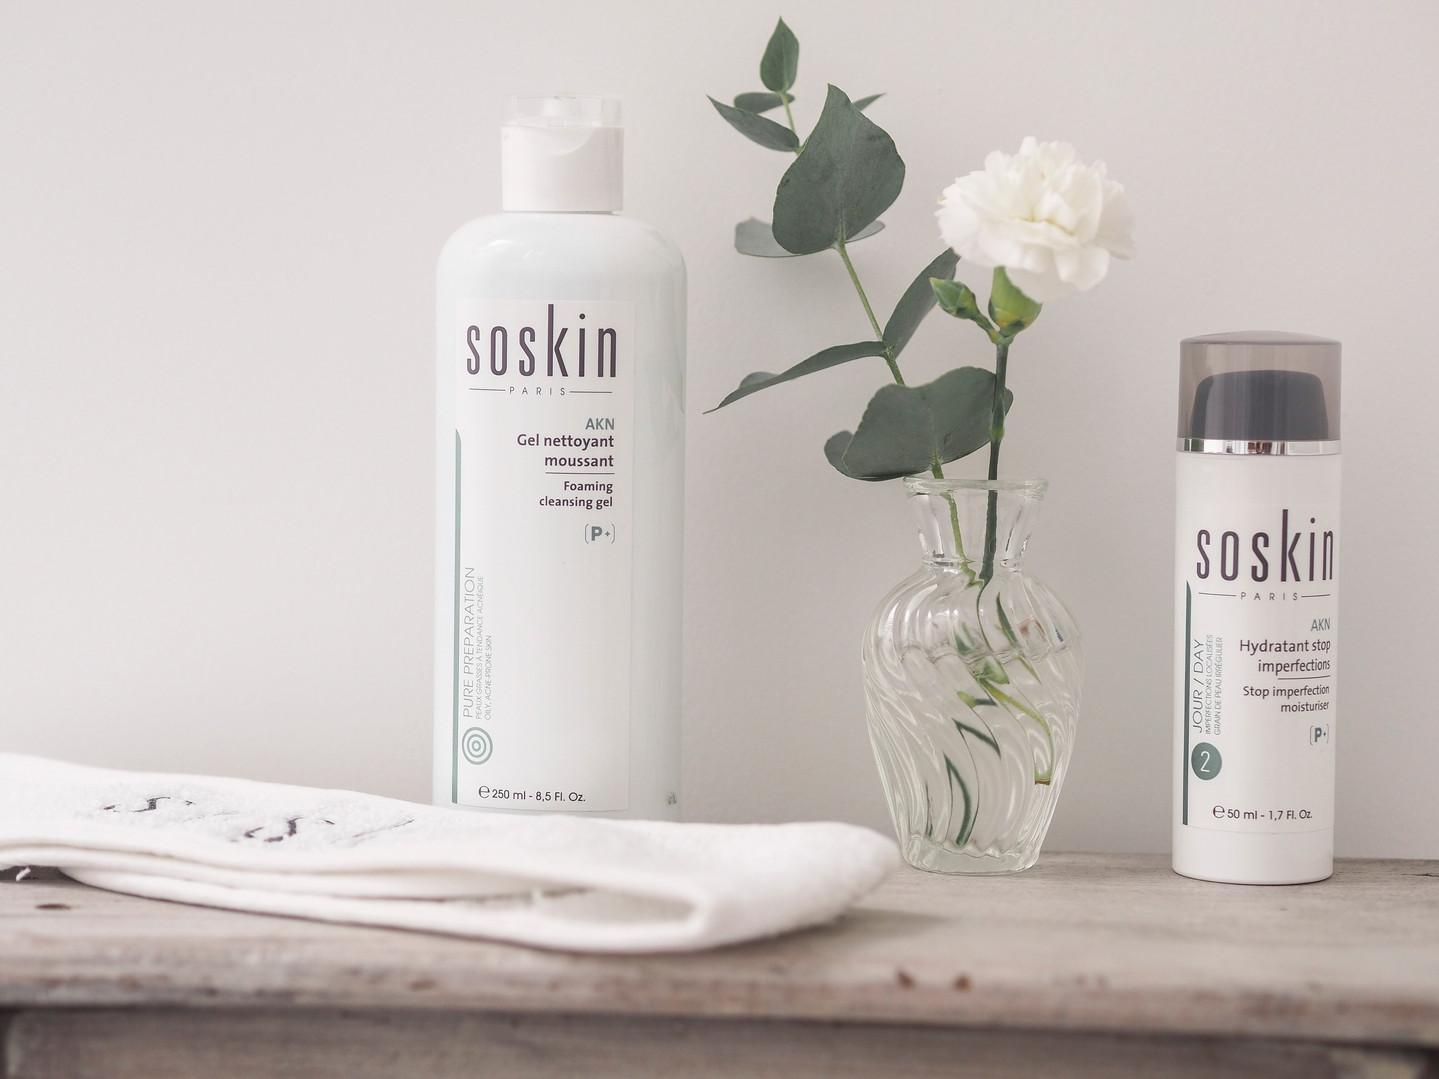 gamme Soskin